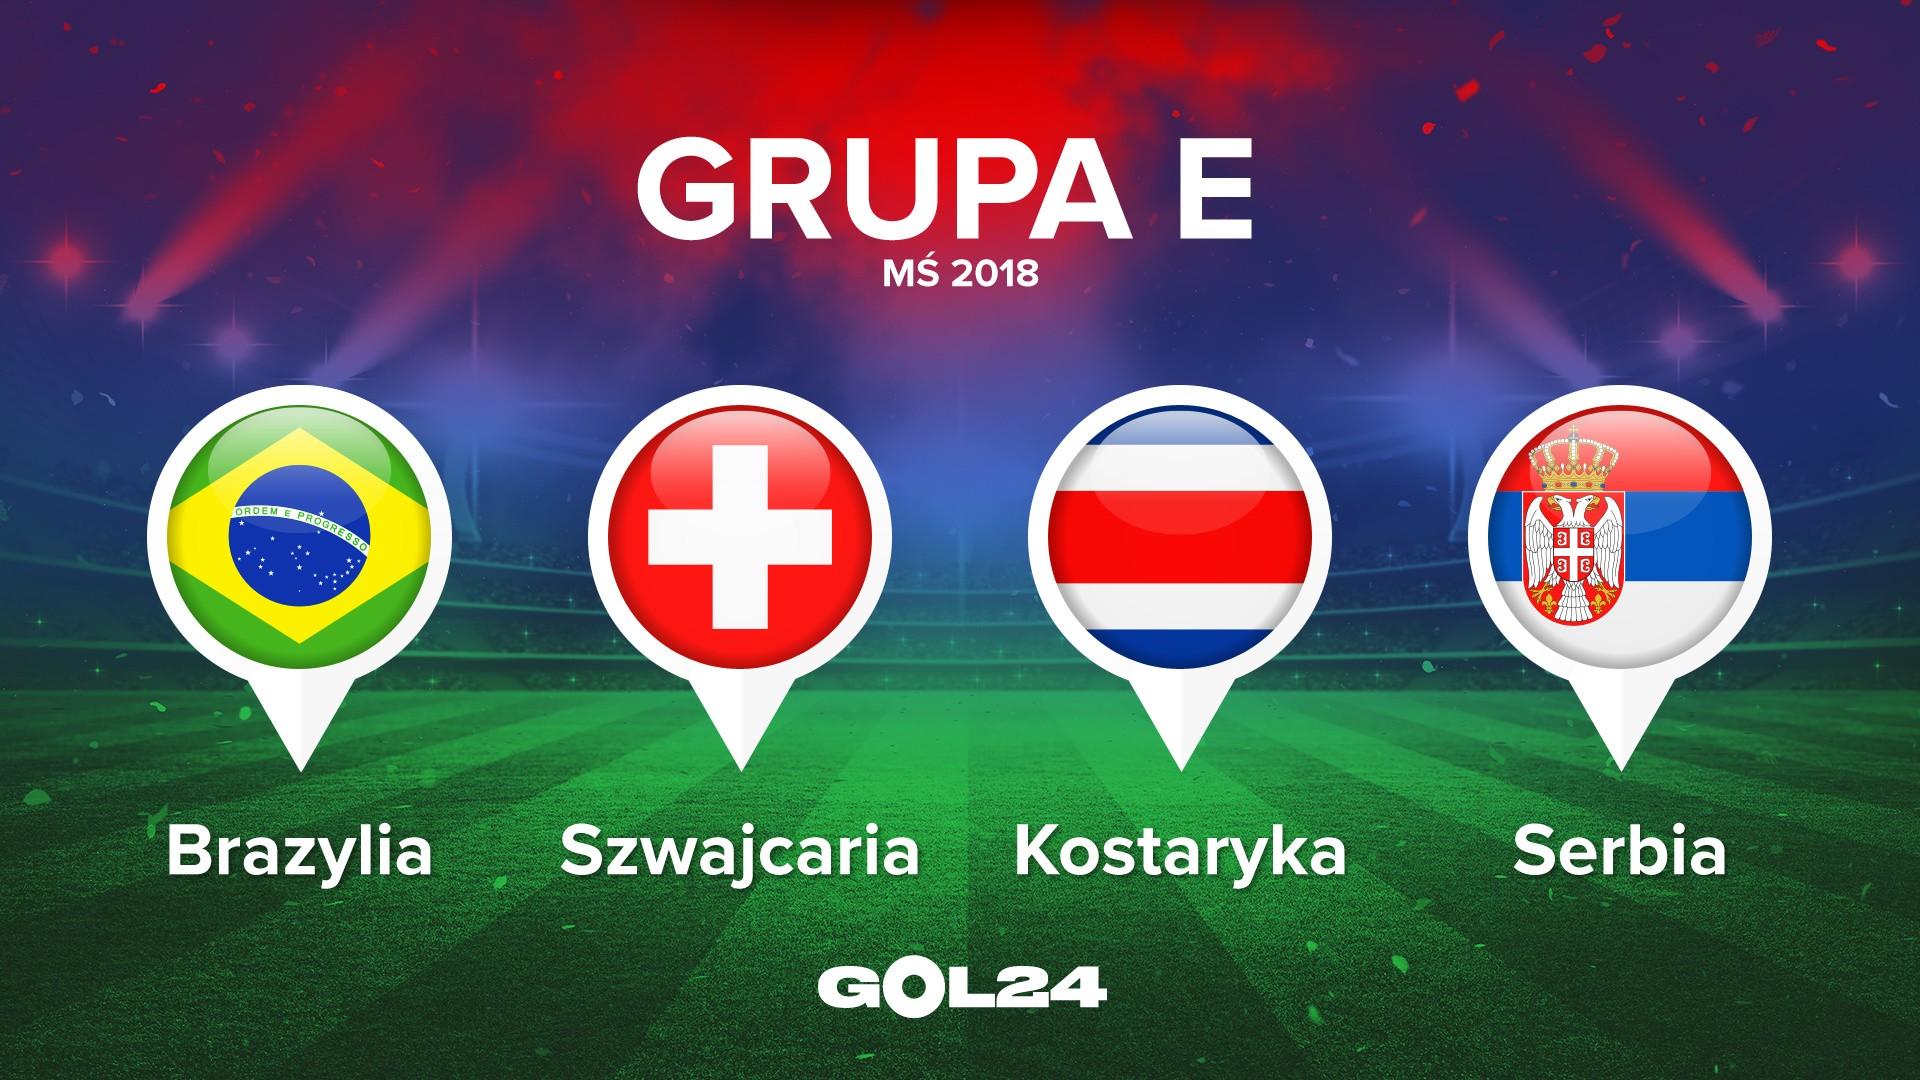 MŚ ROSJA 2018: Kiedy gra Polska? GRUPA H + TERMINARZ ...